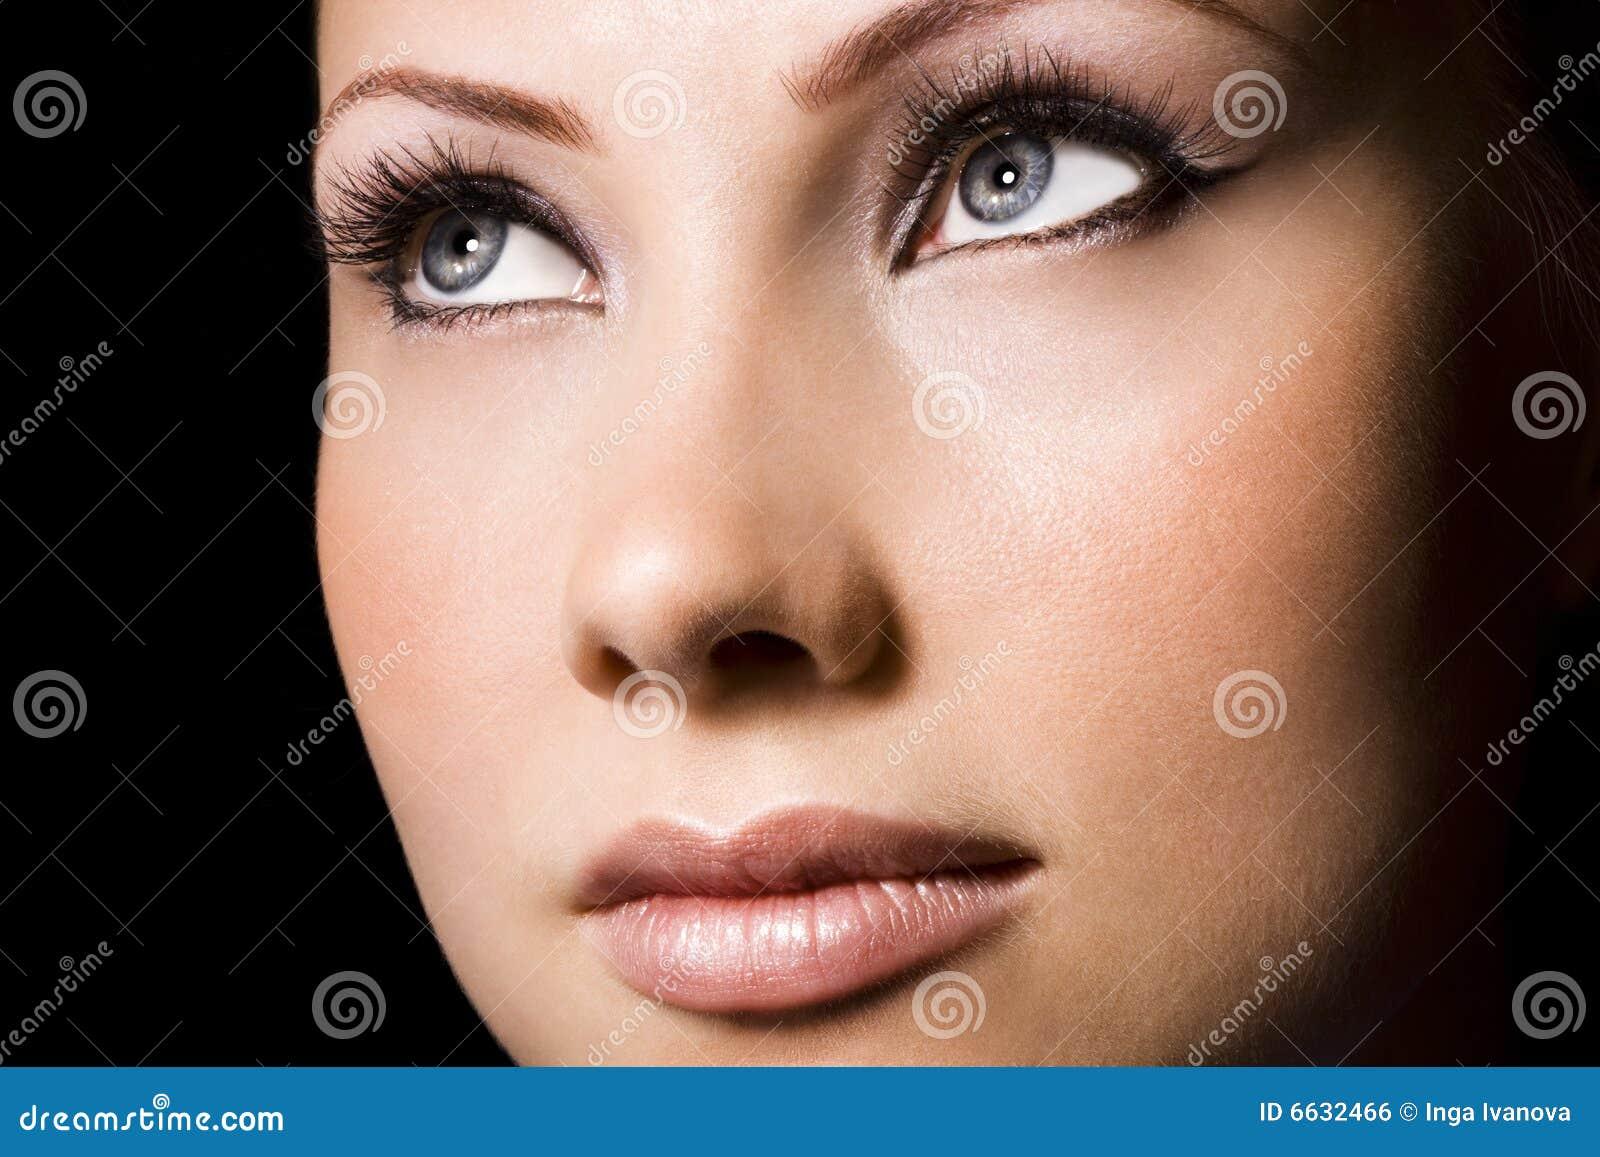 visage de femme photo stock image du renivellement charme 6632466. Black Bedroom Furniture Sets. Home Design Ideas